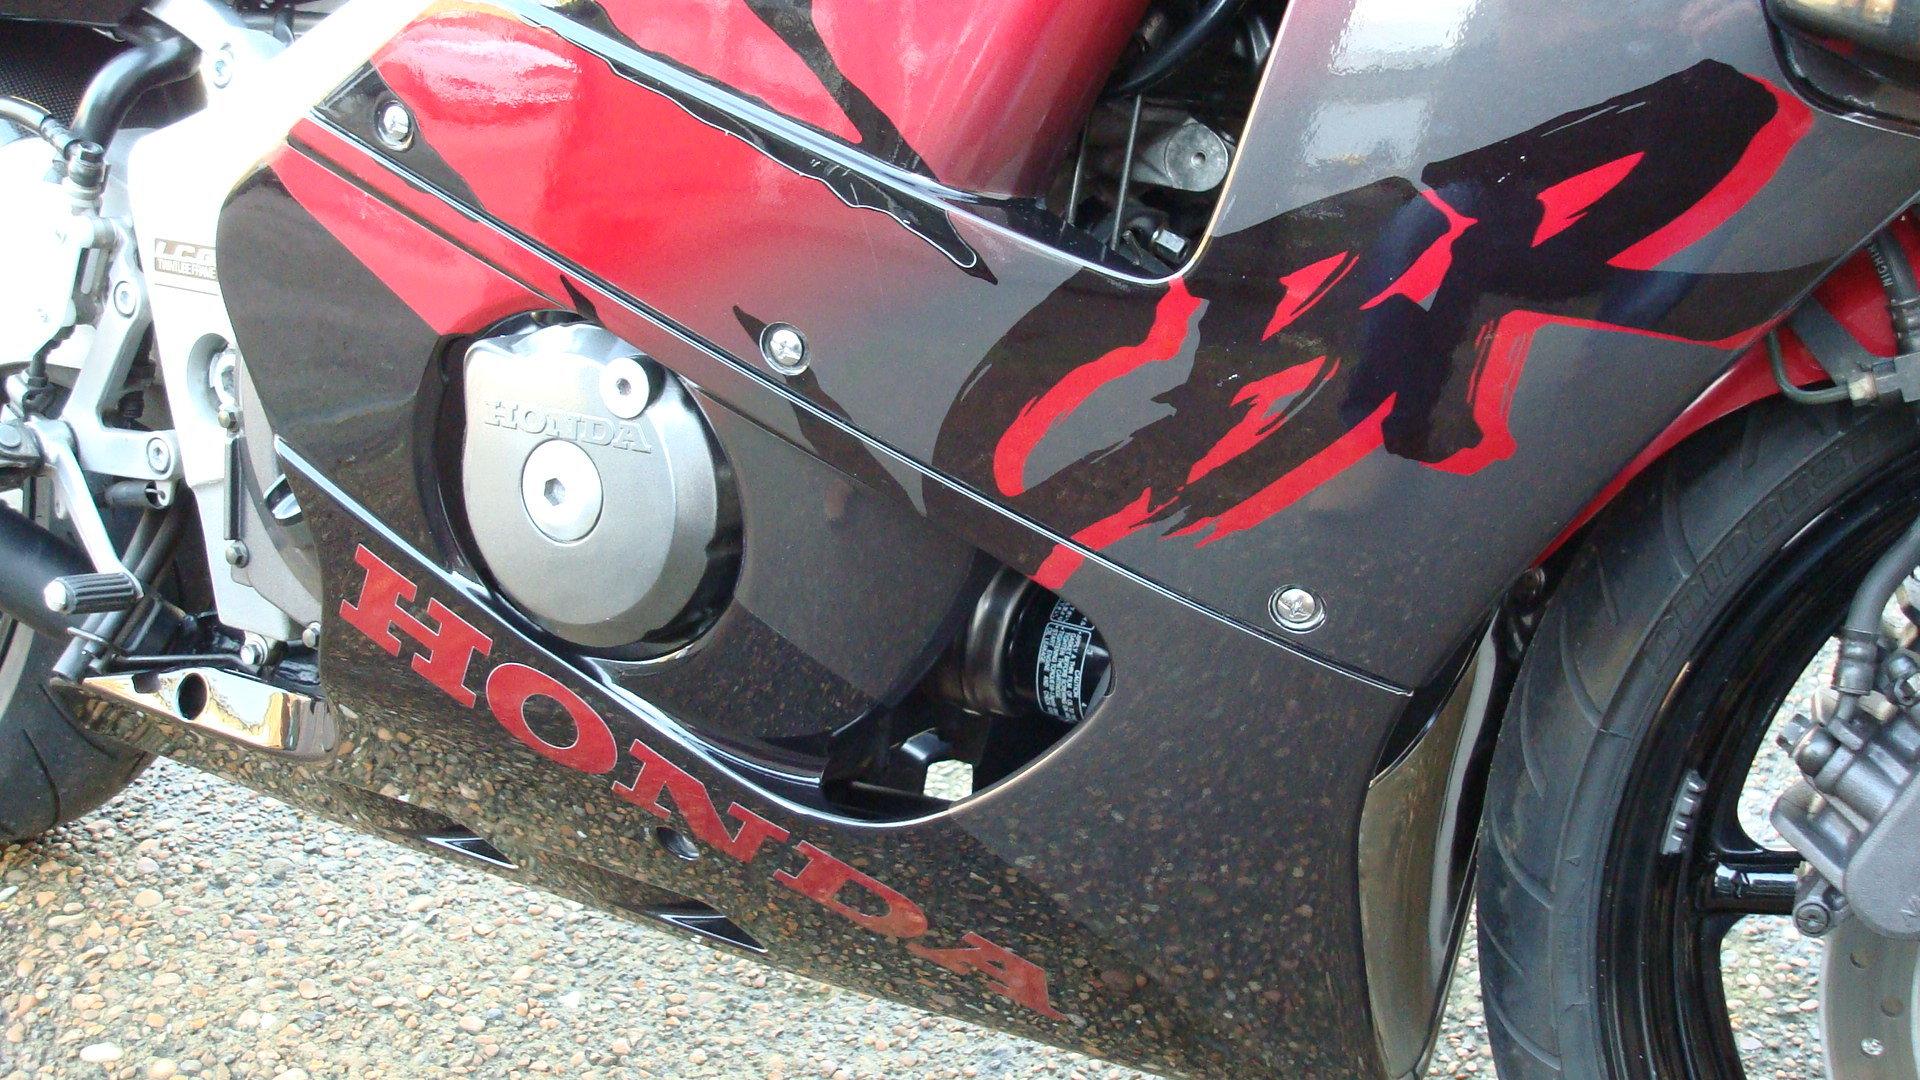 Honda CBR400 RR-R 1998-R **LOW KMS,EXCELLENT CONDITION** For Sale (picture 4 of 6)